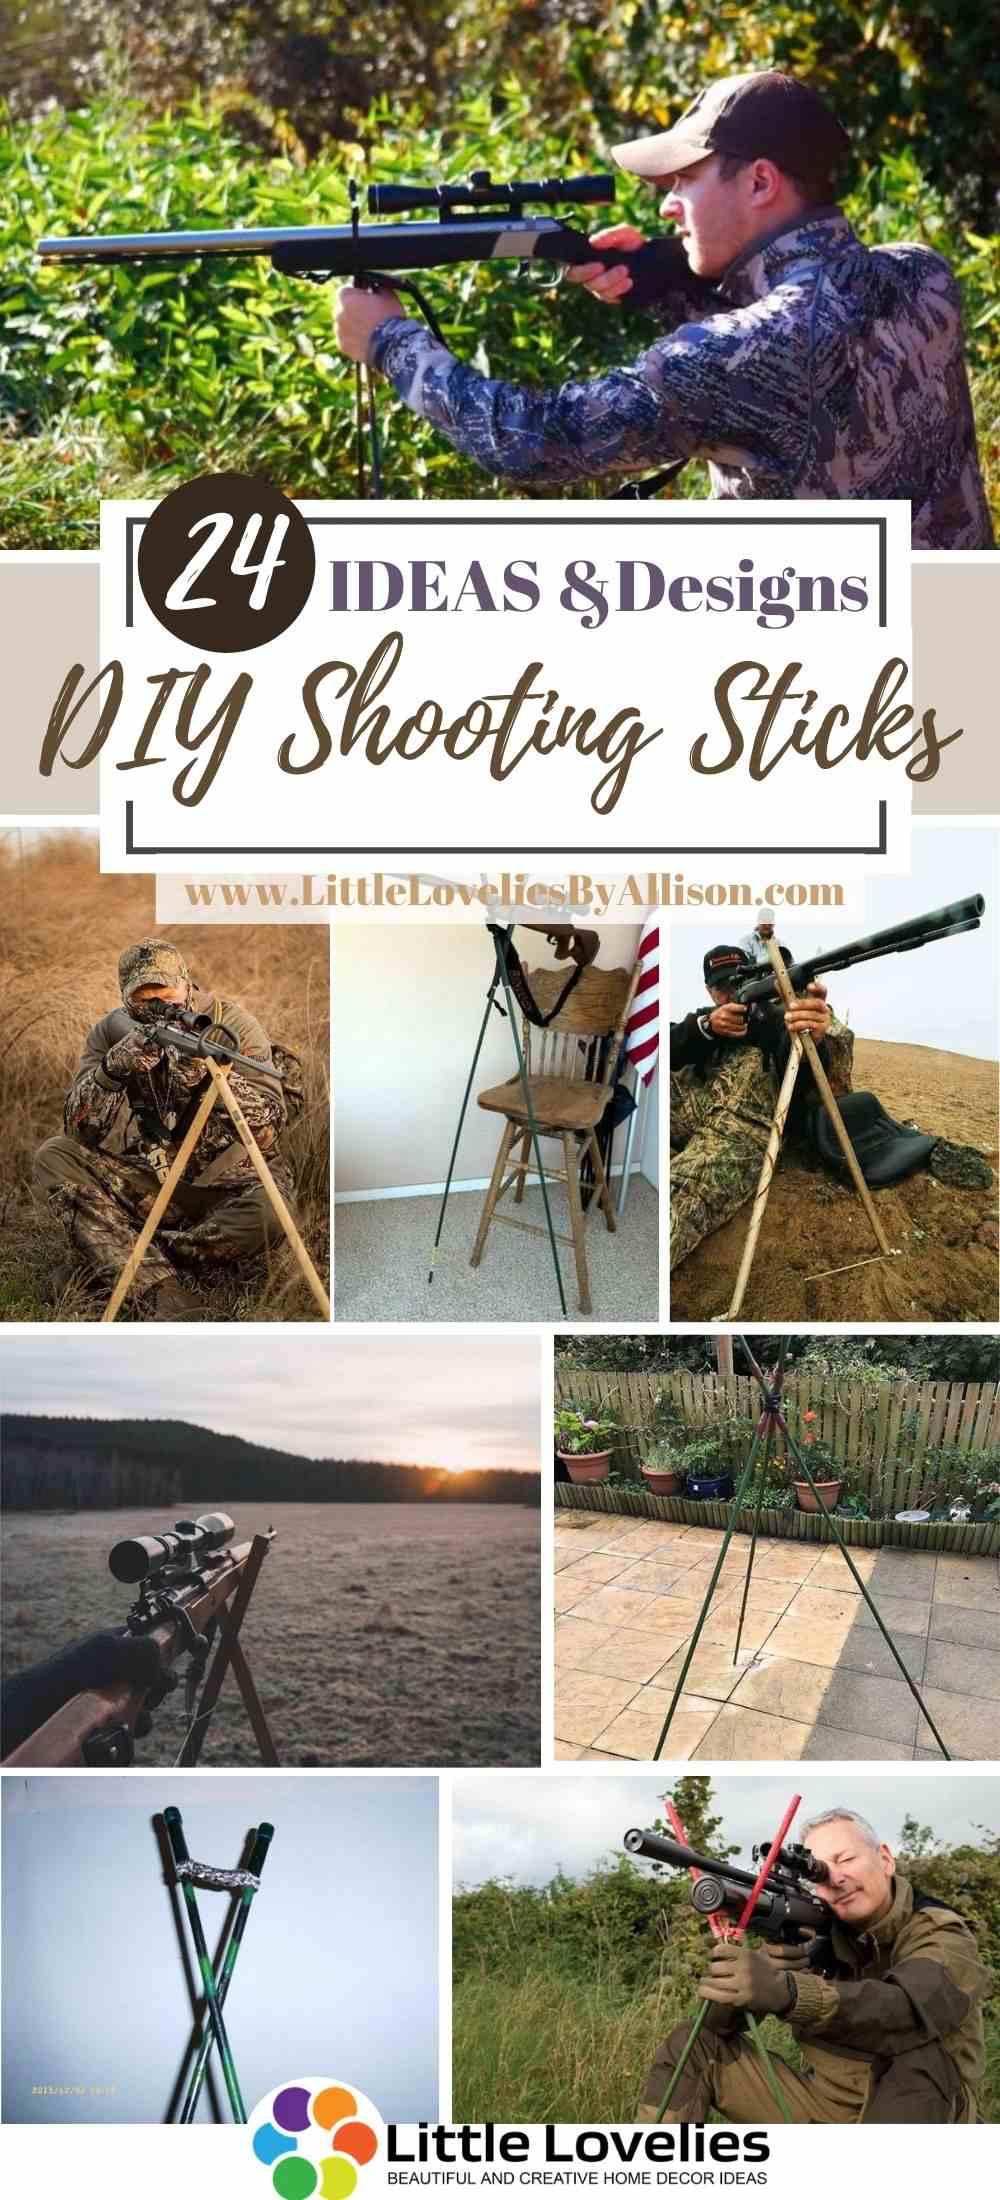 Best-DIY-Shooting-Sticks